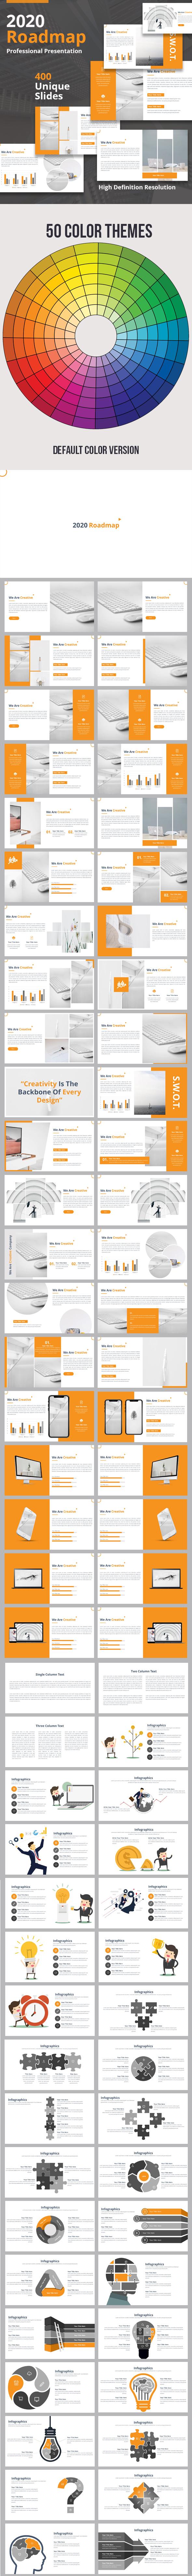 2020 Roadmap - Multipurpose Powerpoint Template